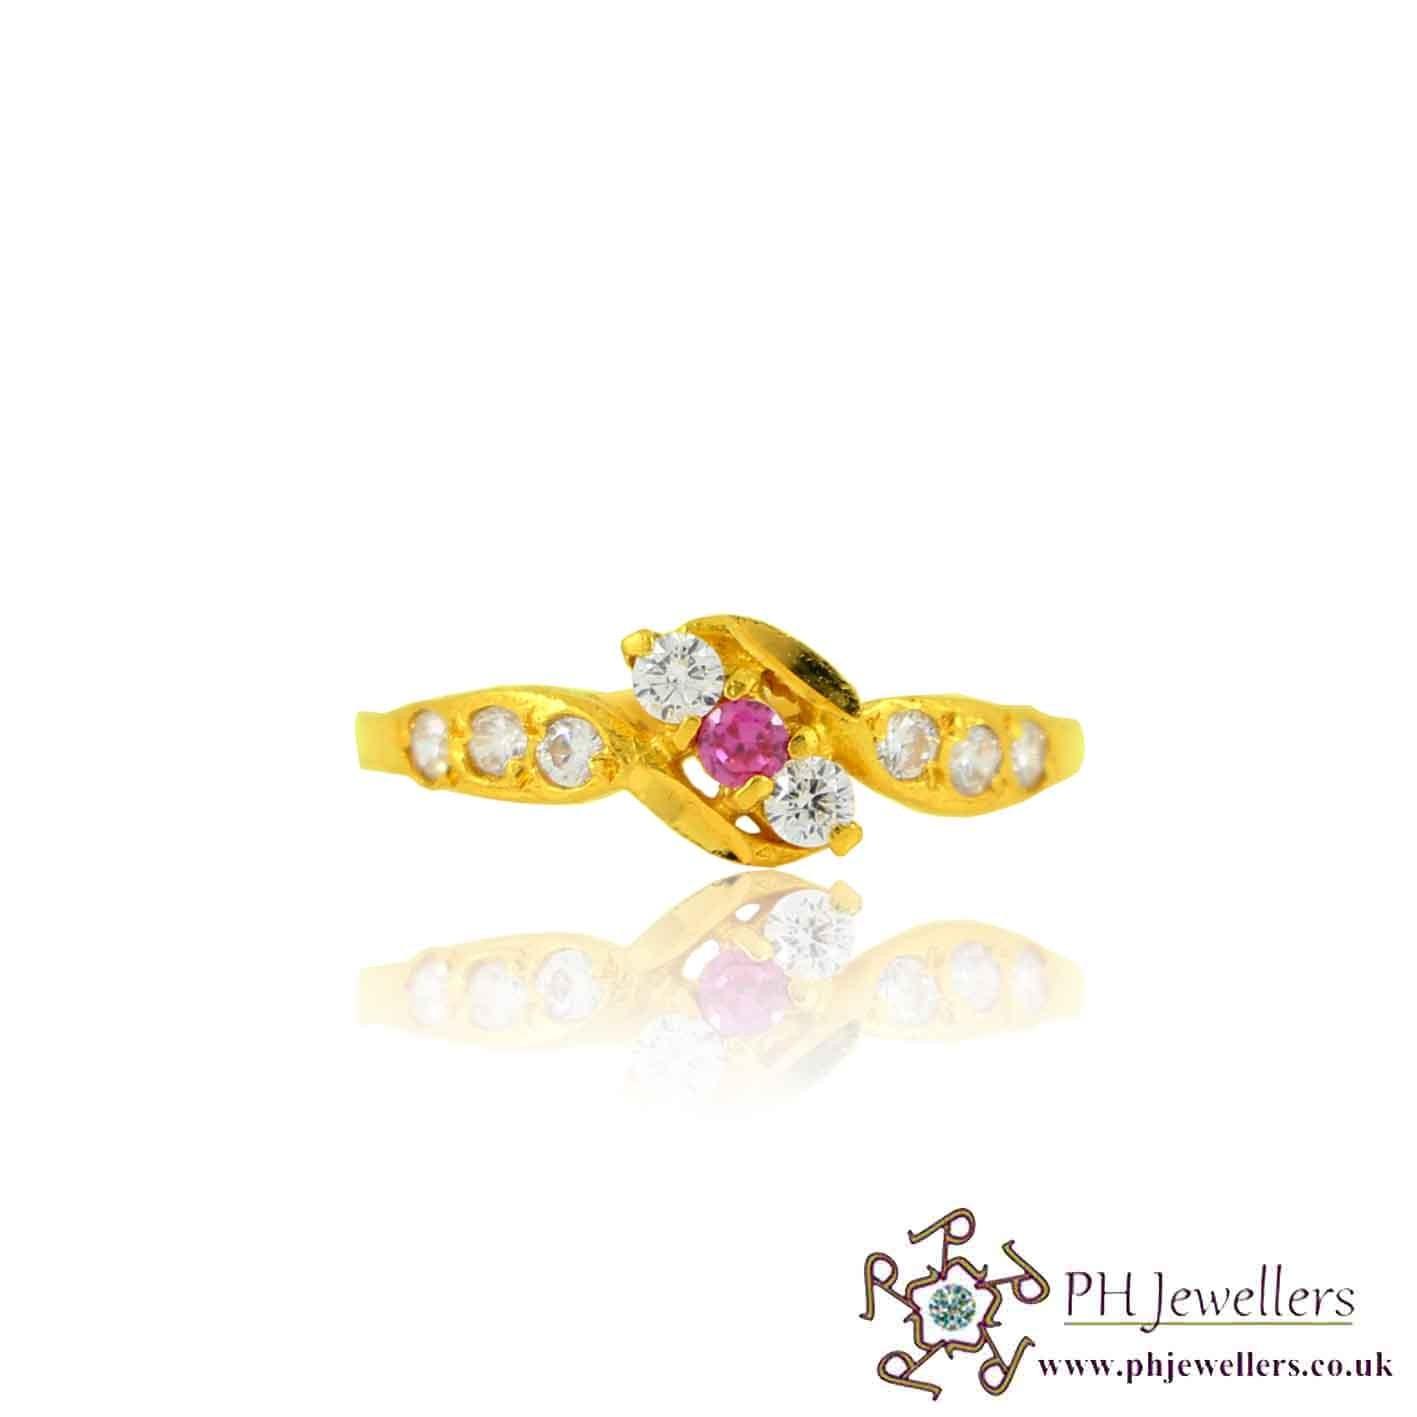 22ct 916 Yellow Gold Hallmark Ruby Ring CZ Size J 1/2 SR131